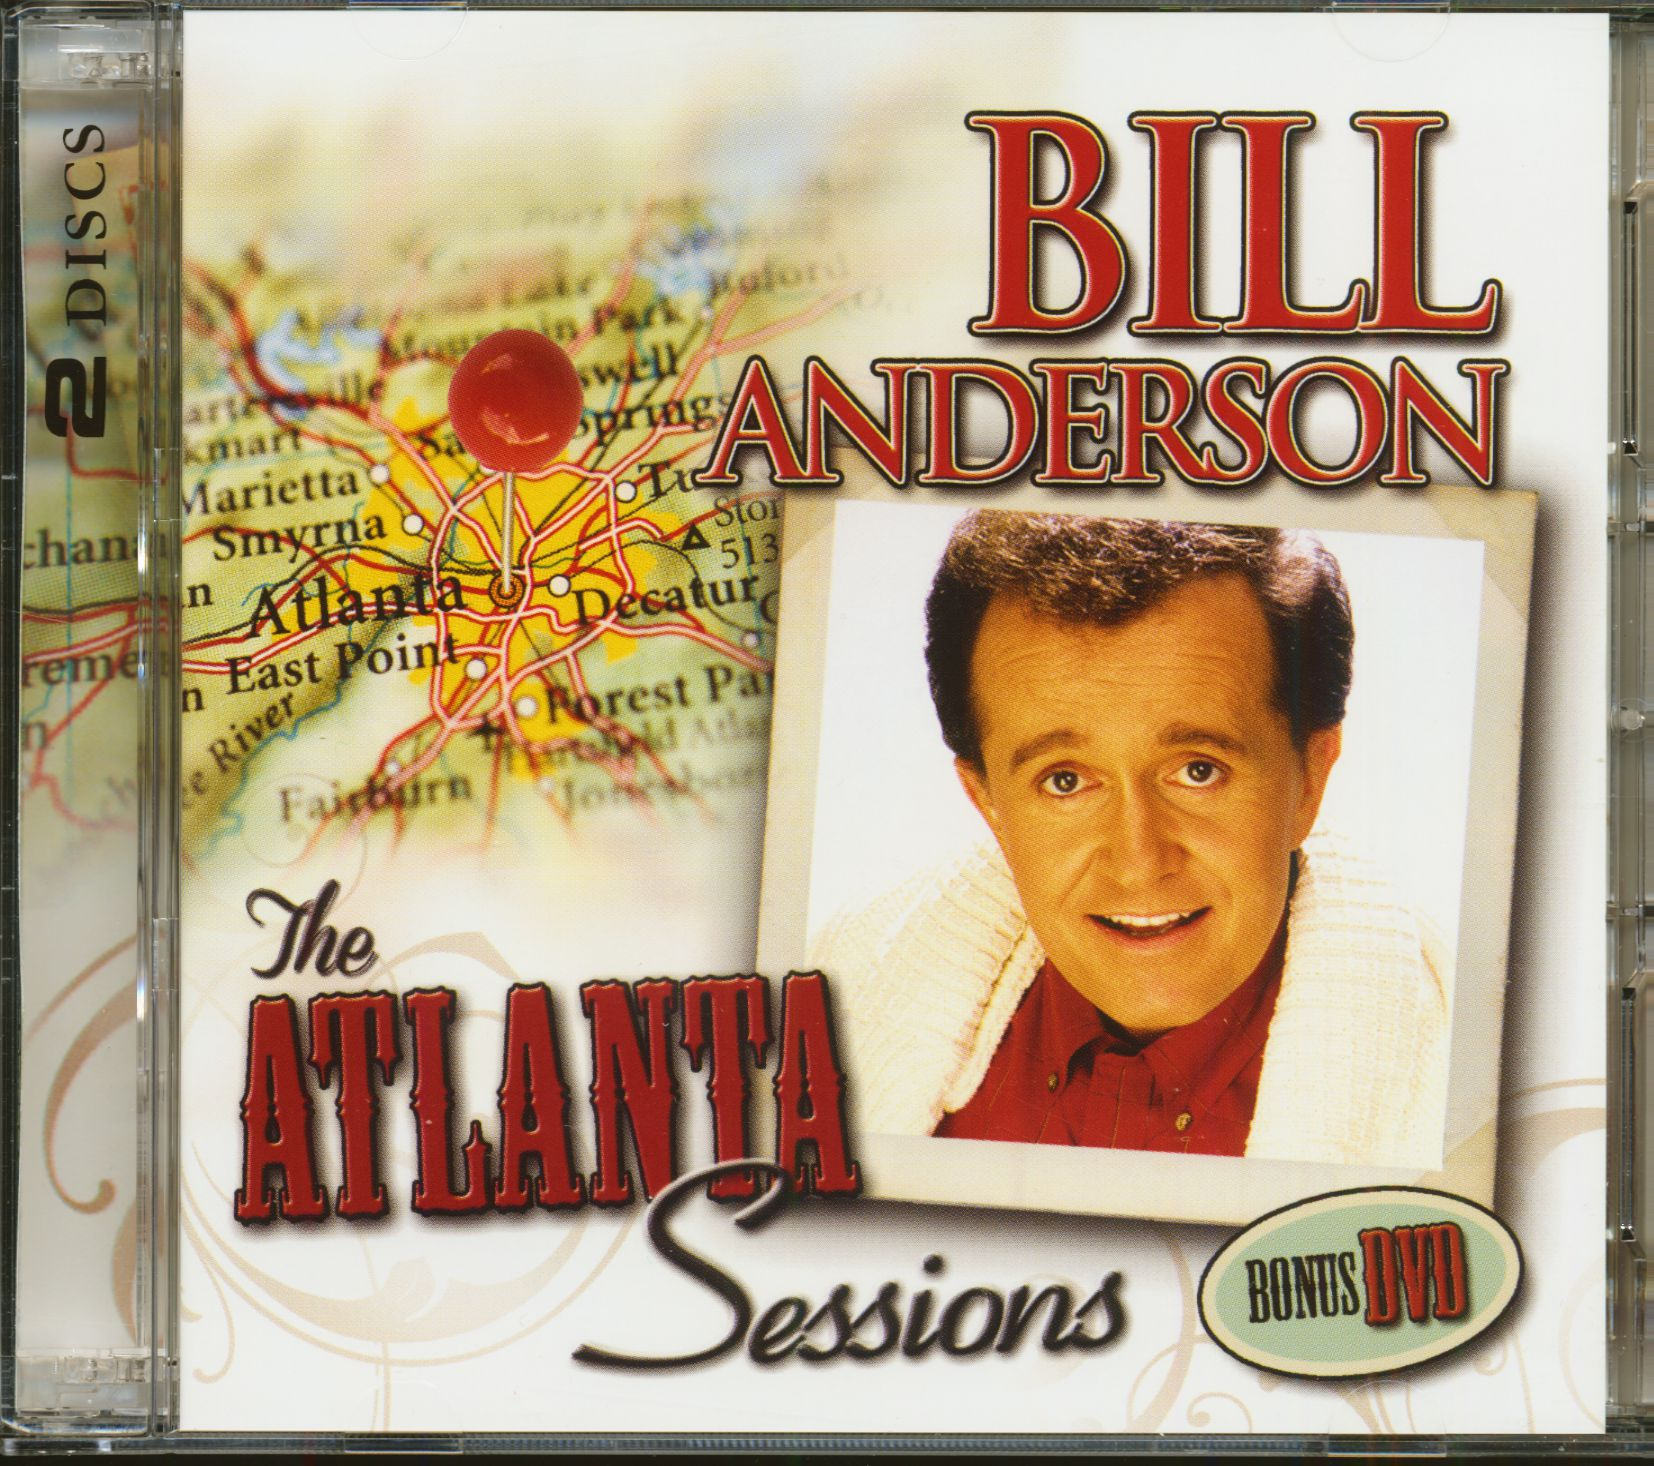 Bill Anderson The Atlanta Sessions (CD & DVD)